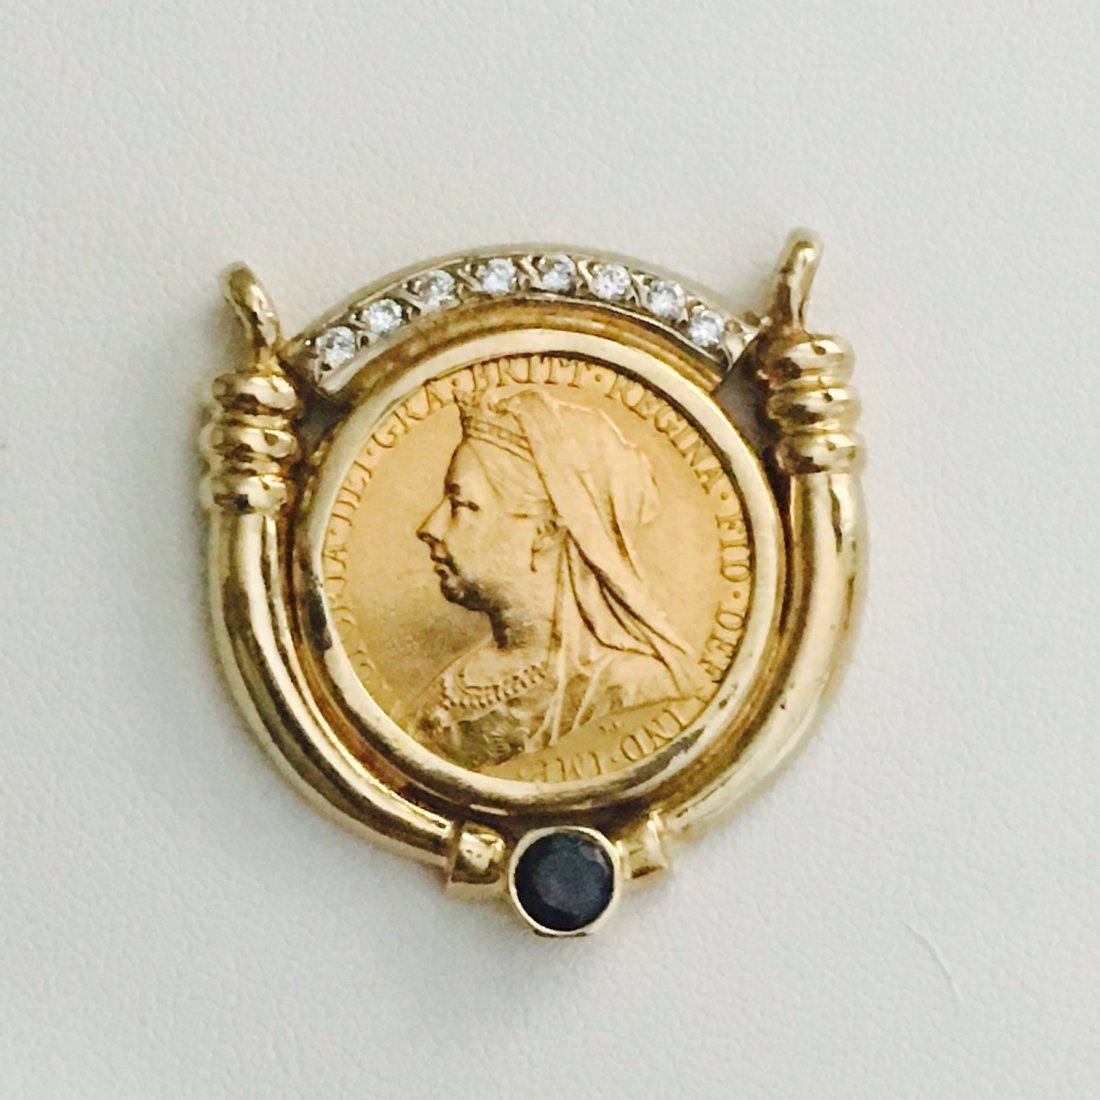 1899 QUEEN VICTORIA GOLD COIN W/ DIAMOND  BLUE SAPPHIRE - 6